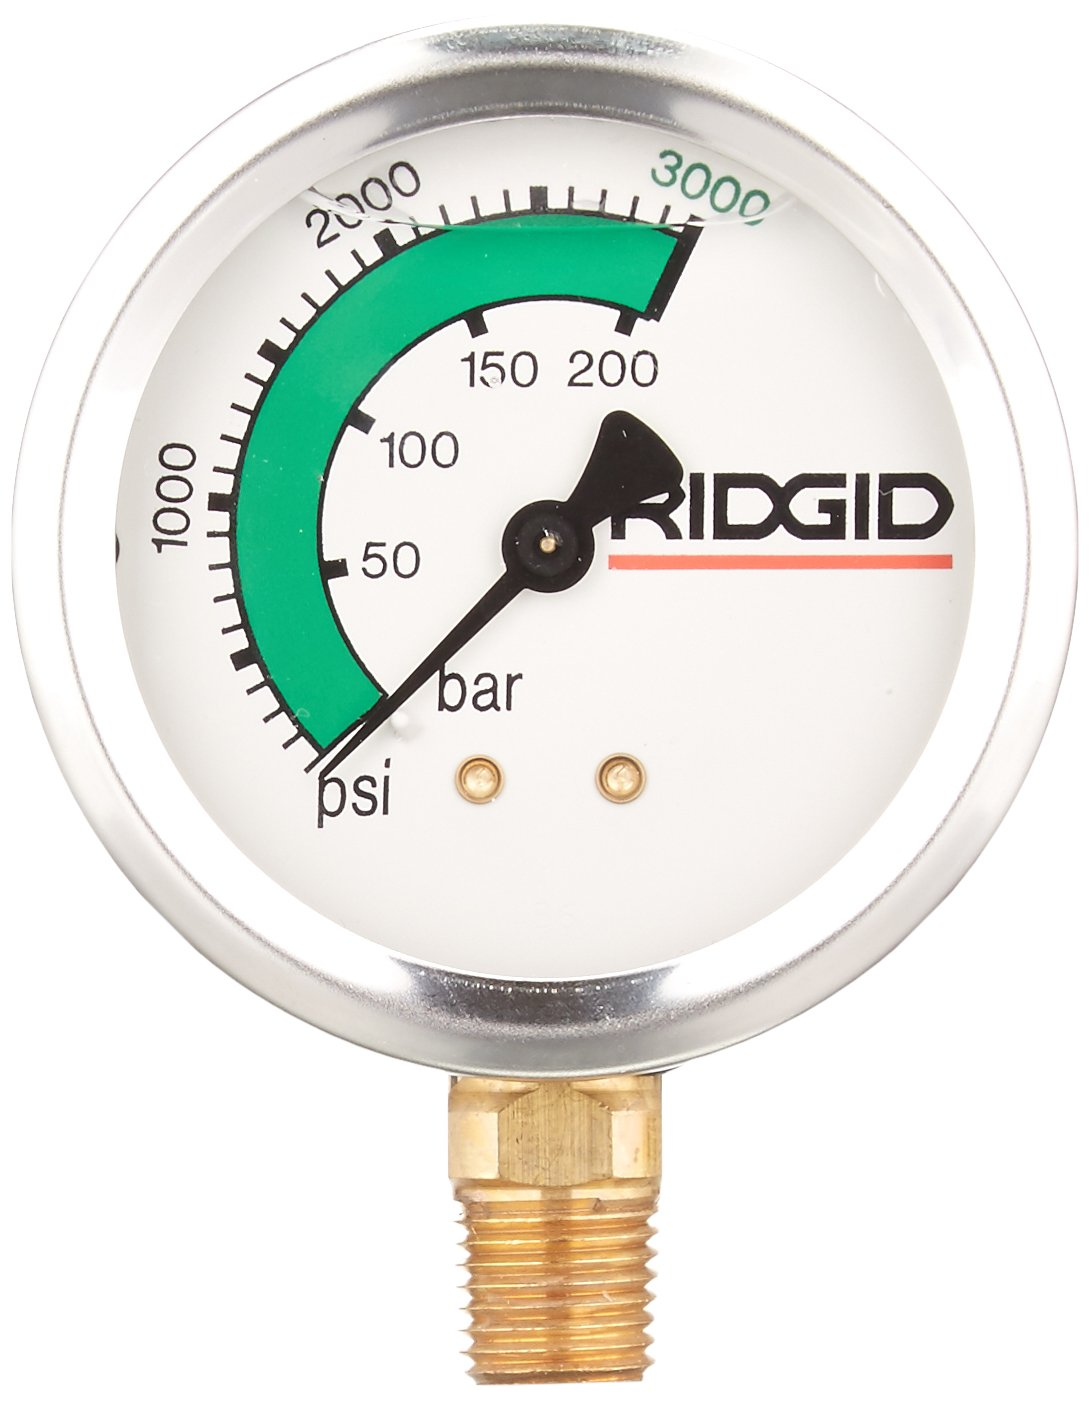 Ridgid 66117 Gauge, Pressure Kj3000 by Ridgid